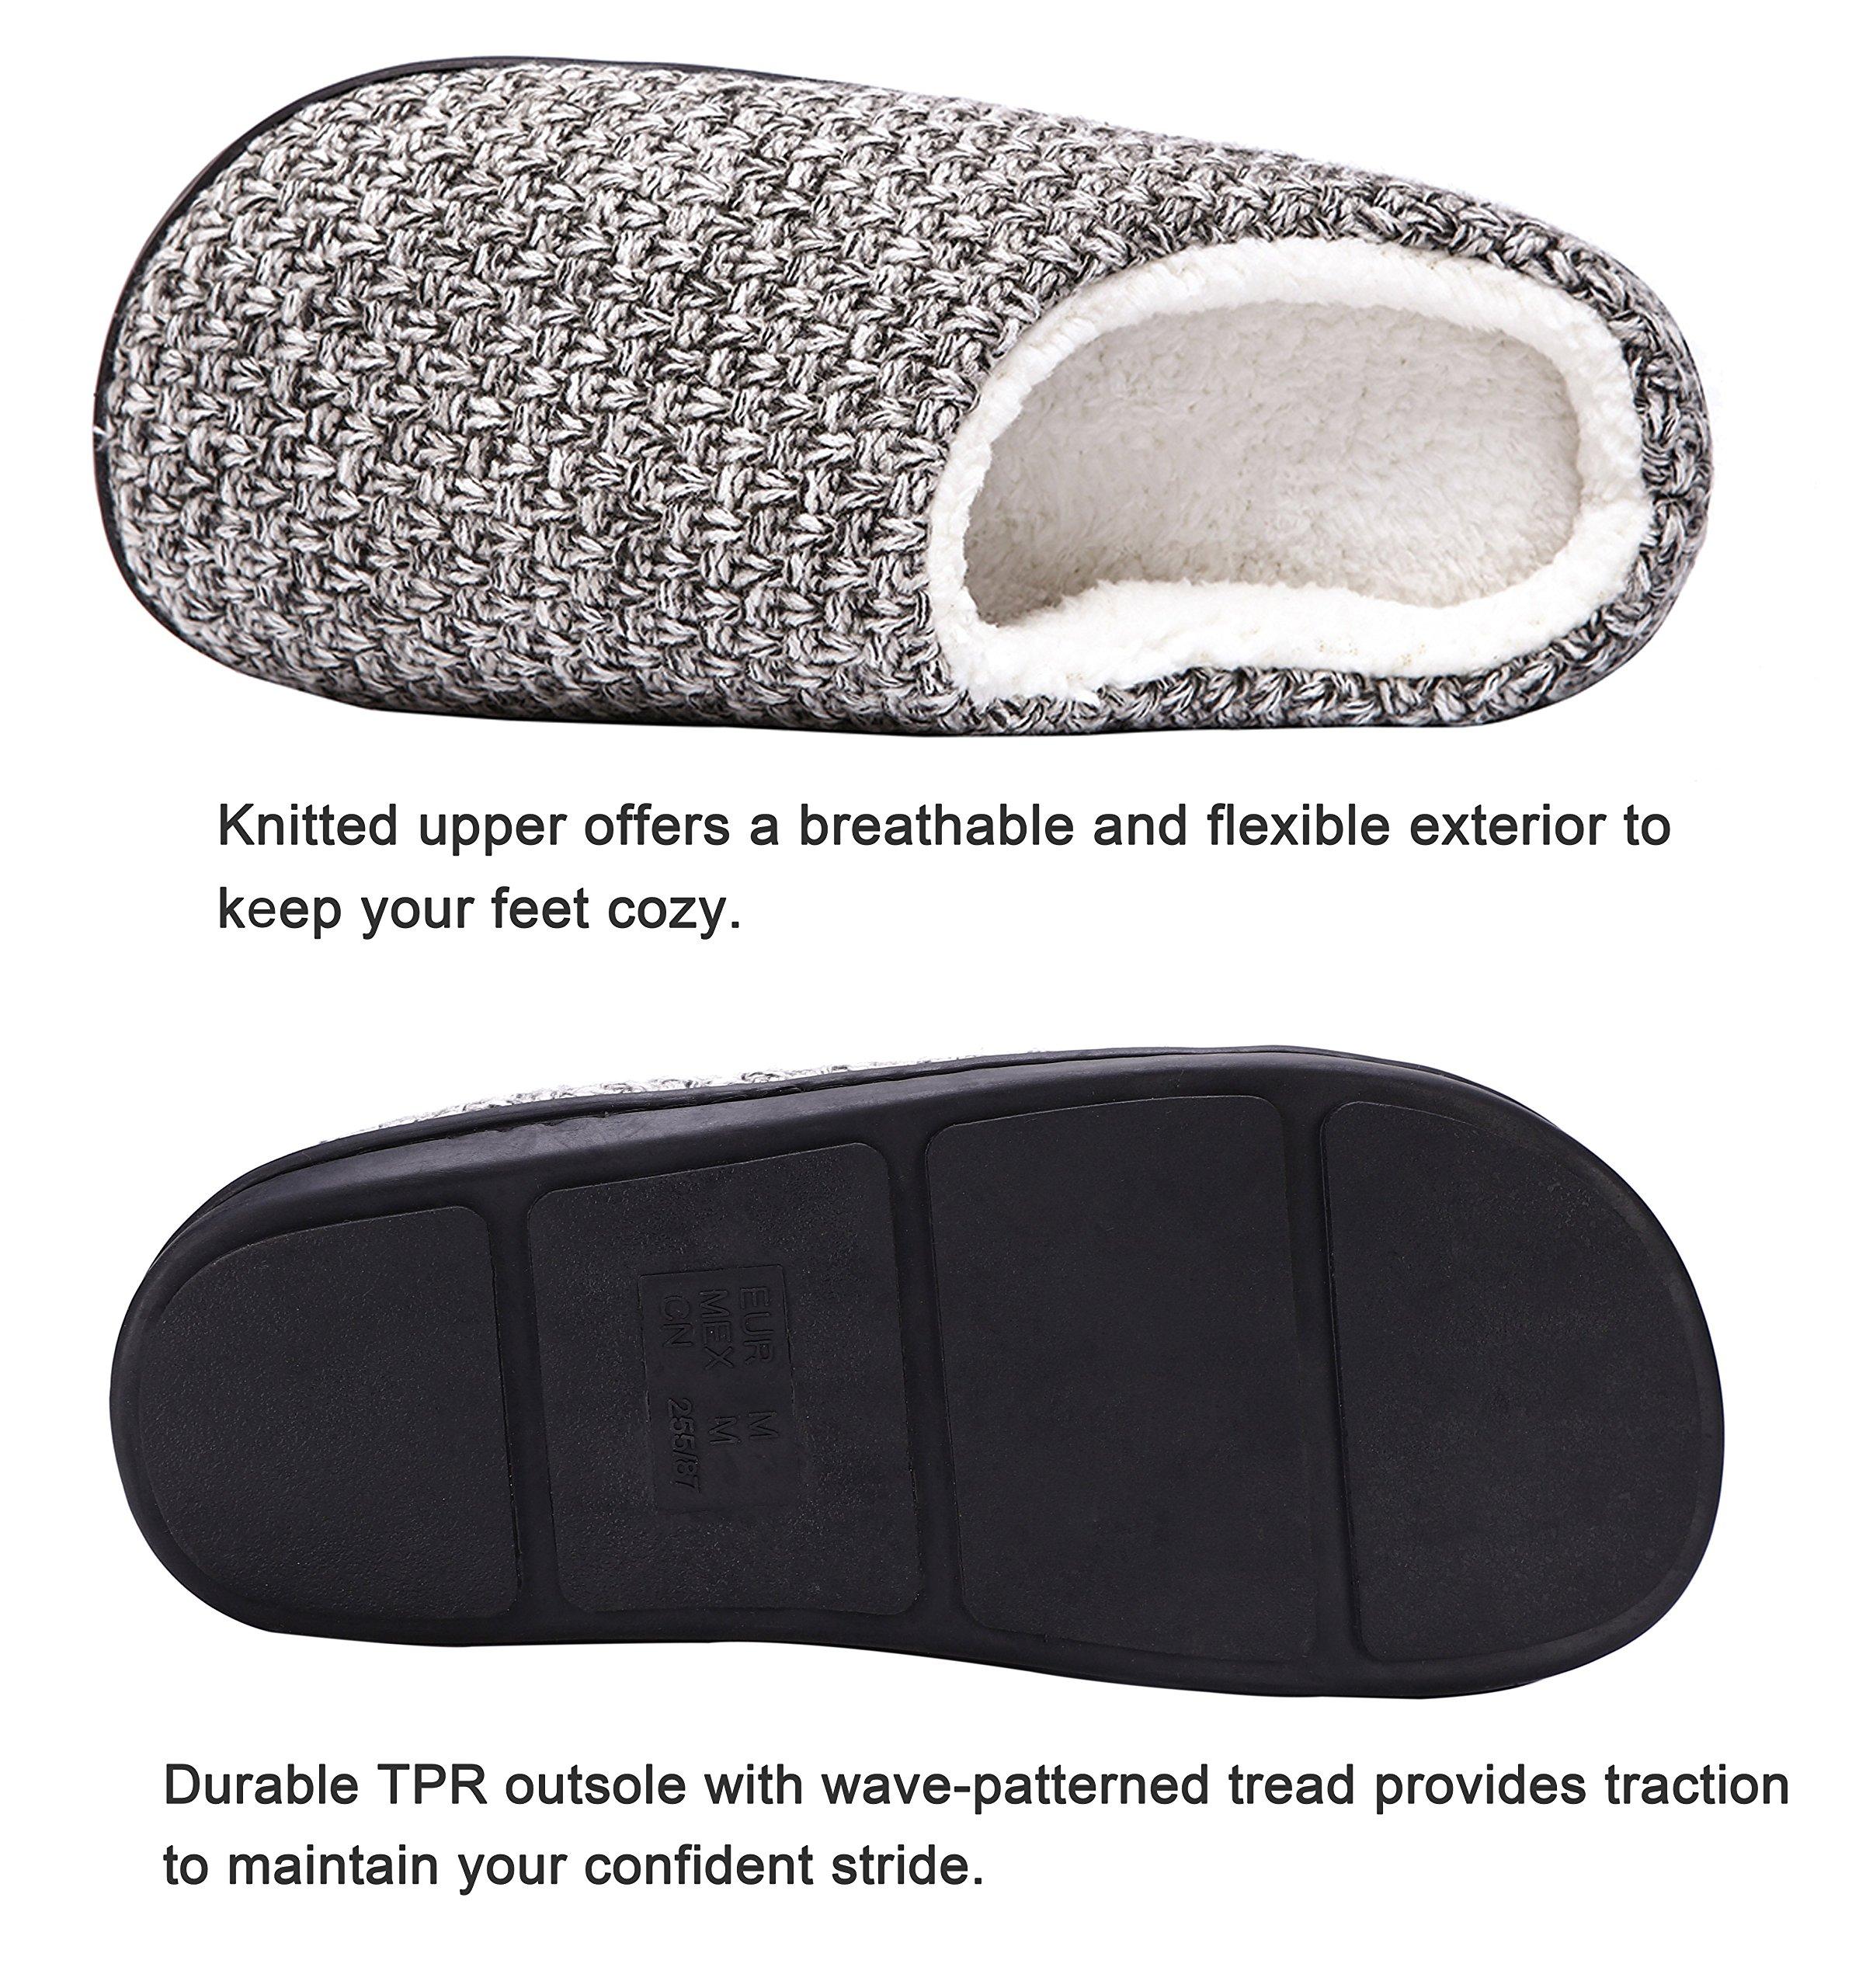 DRSLPAR House Memory Foam Slippers Comfort Plush Lining Slip-on Knit Indoor Outdoor Shoes for Men Women(Grey-Beige X-Large) by DRSLPAR (Image #5)